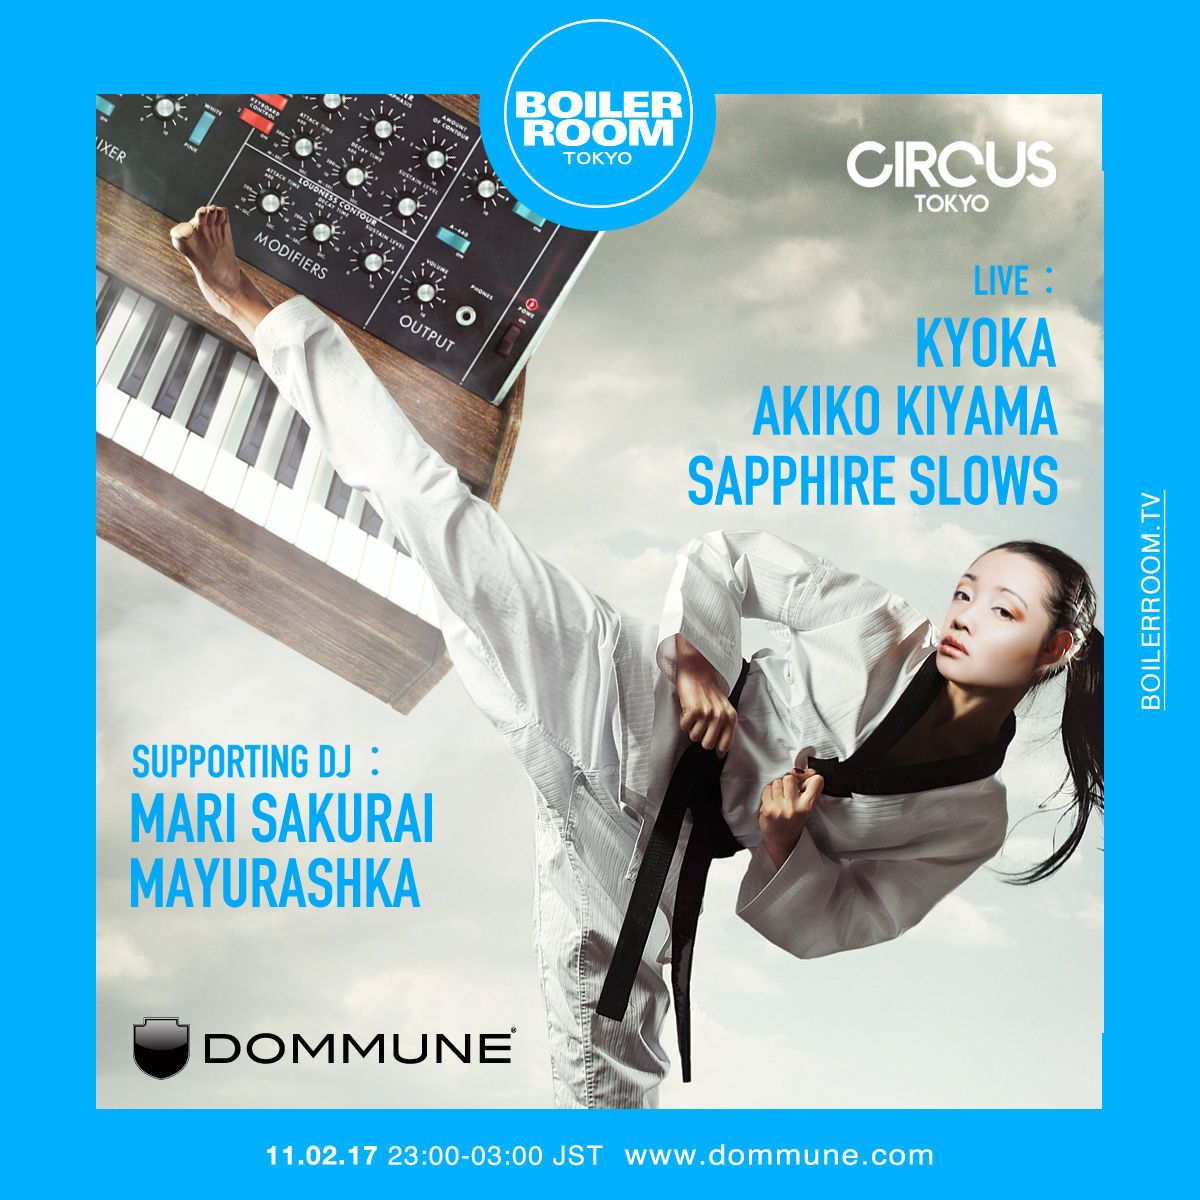 Boiler Room Tokyo / DOMMUNE [2017-02-11 (Sat)] | clubberia